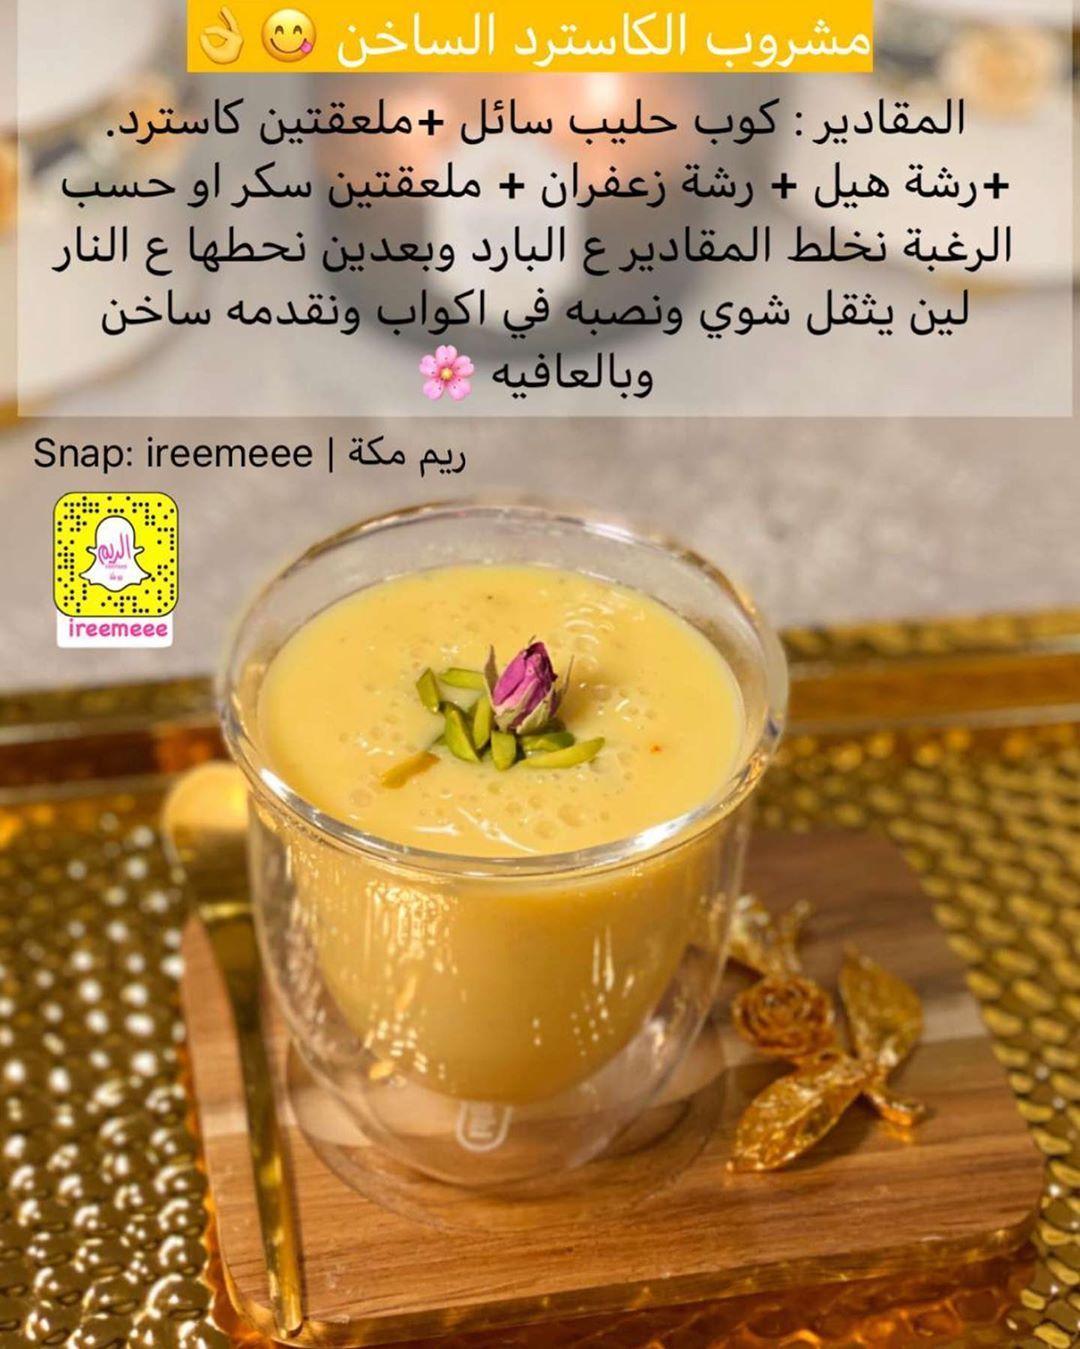 1 347 Mentions J Aime 0 Commentaires الح مد لله فوق ك ل ش عور Aklat25 Sur Instagram وصفات م Coffee Drink Recipes Food Drinks Dessert Cookout Food